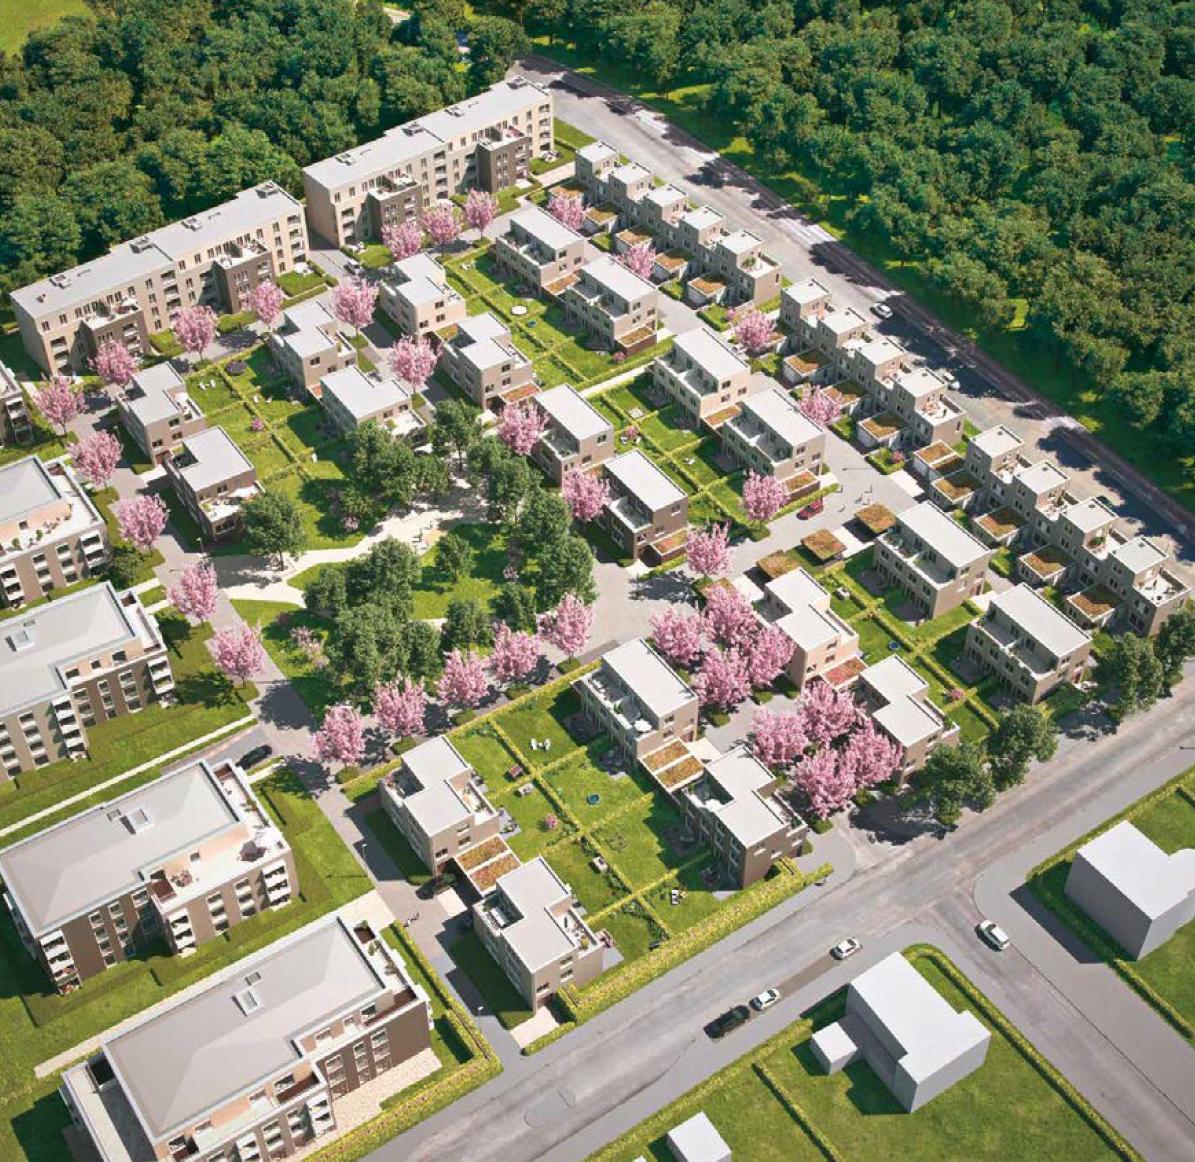 Junkersdorfer Stadtgärten